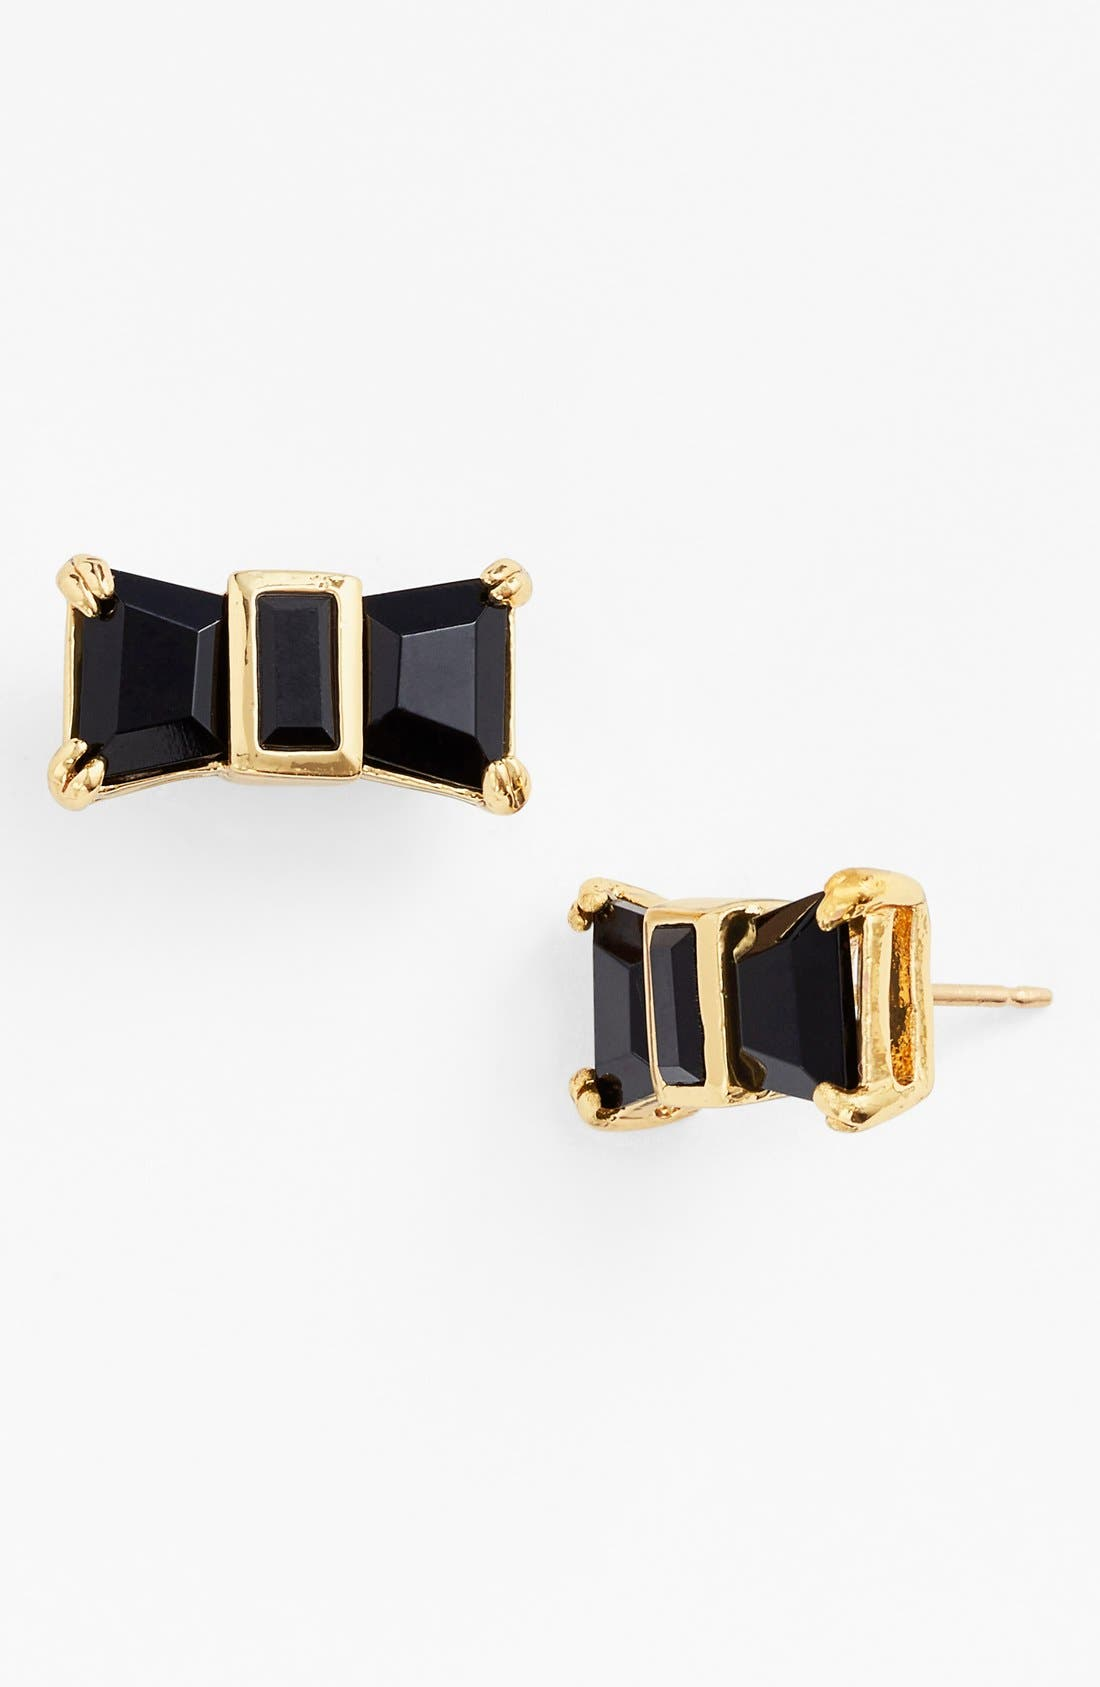 Main Image - kate spade new york 'jackpot jewels' bow stud earrings